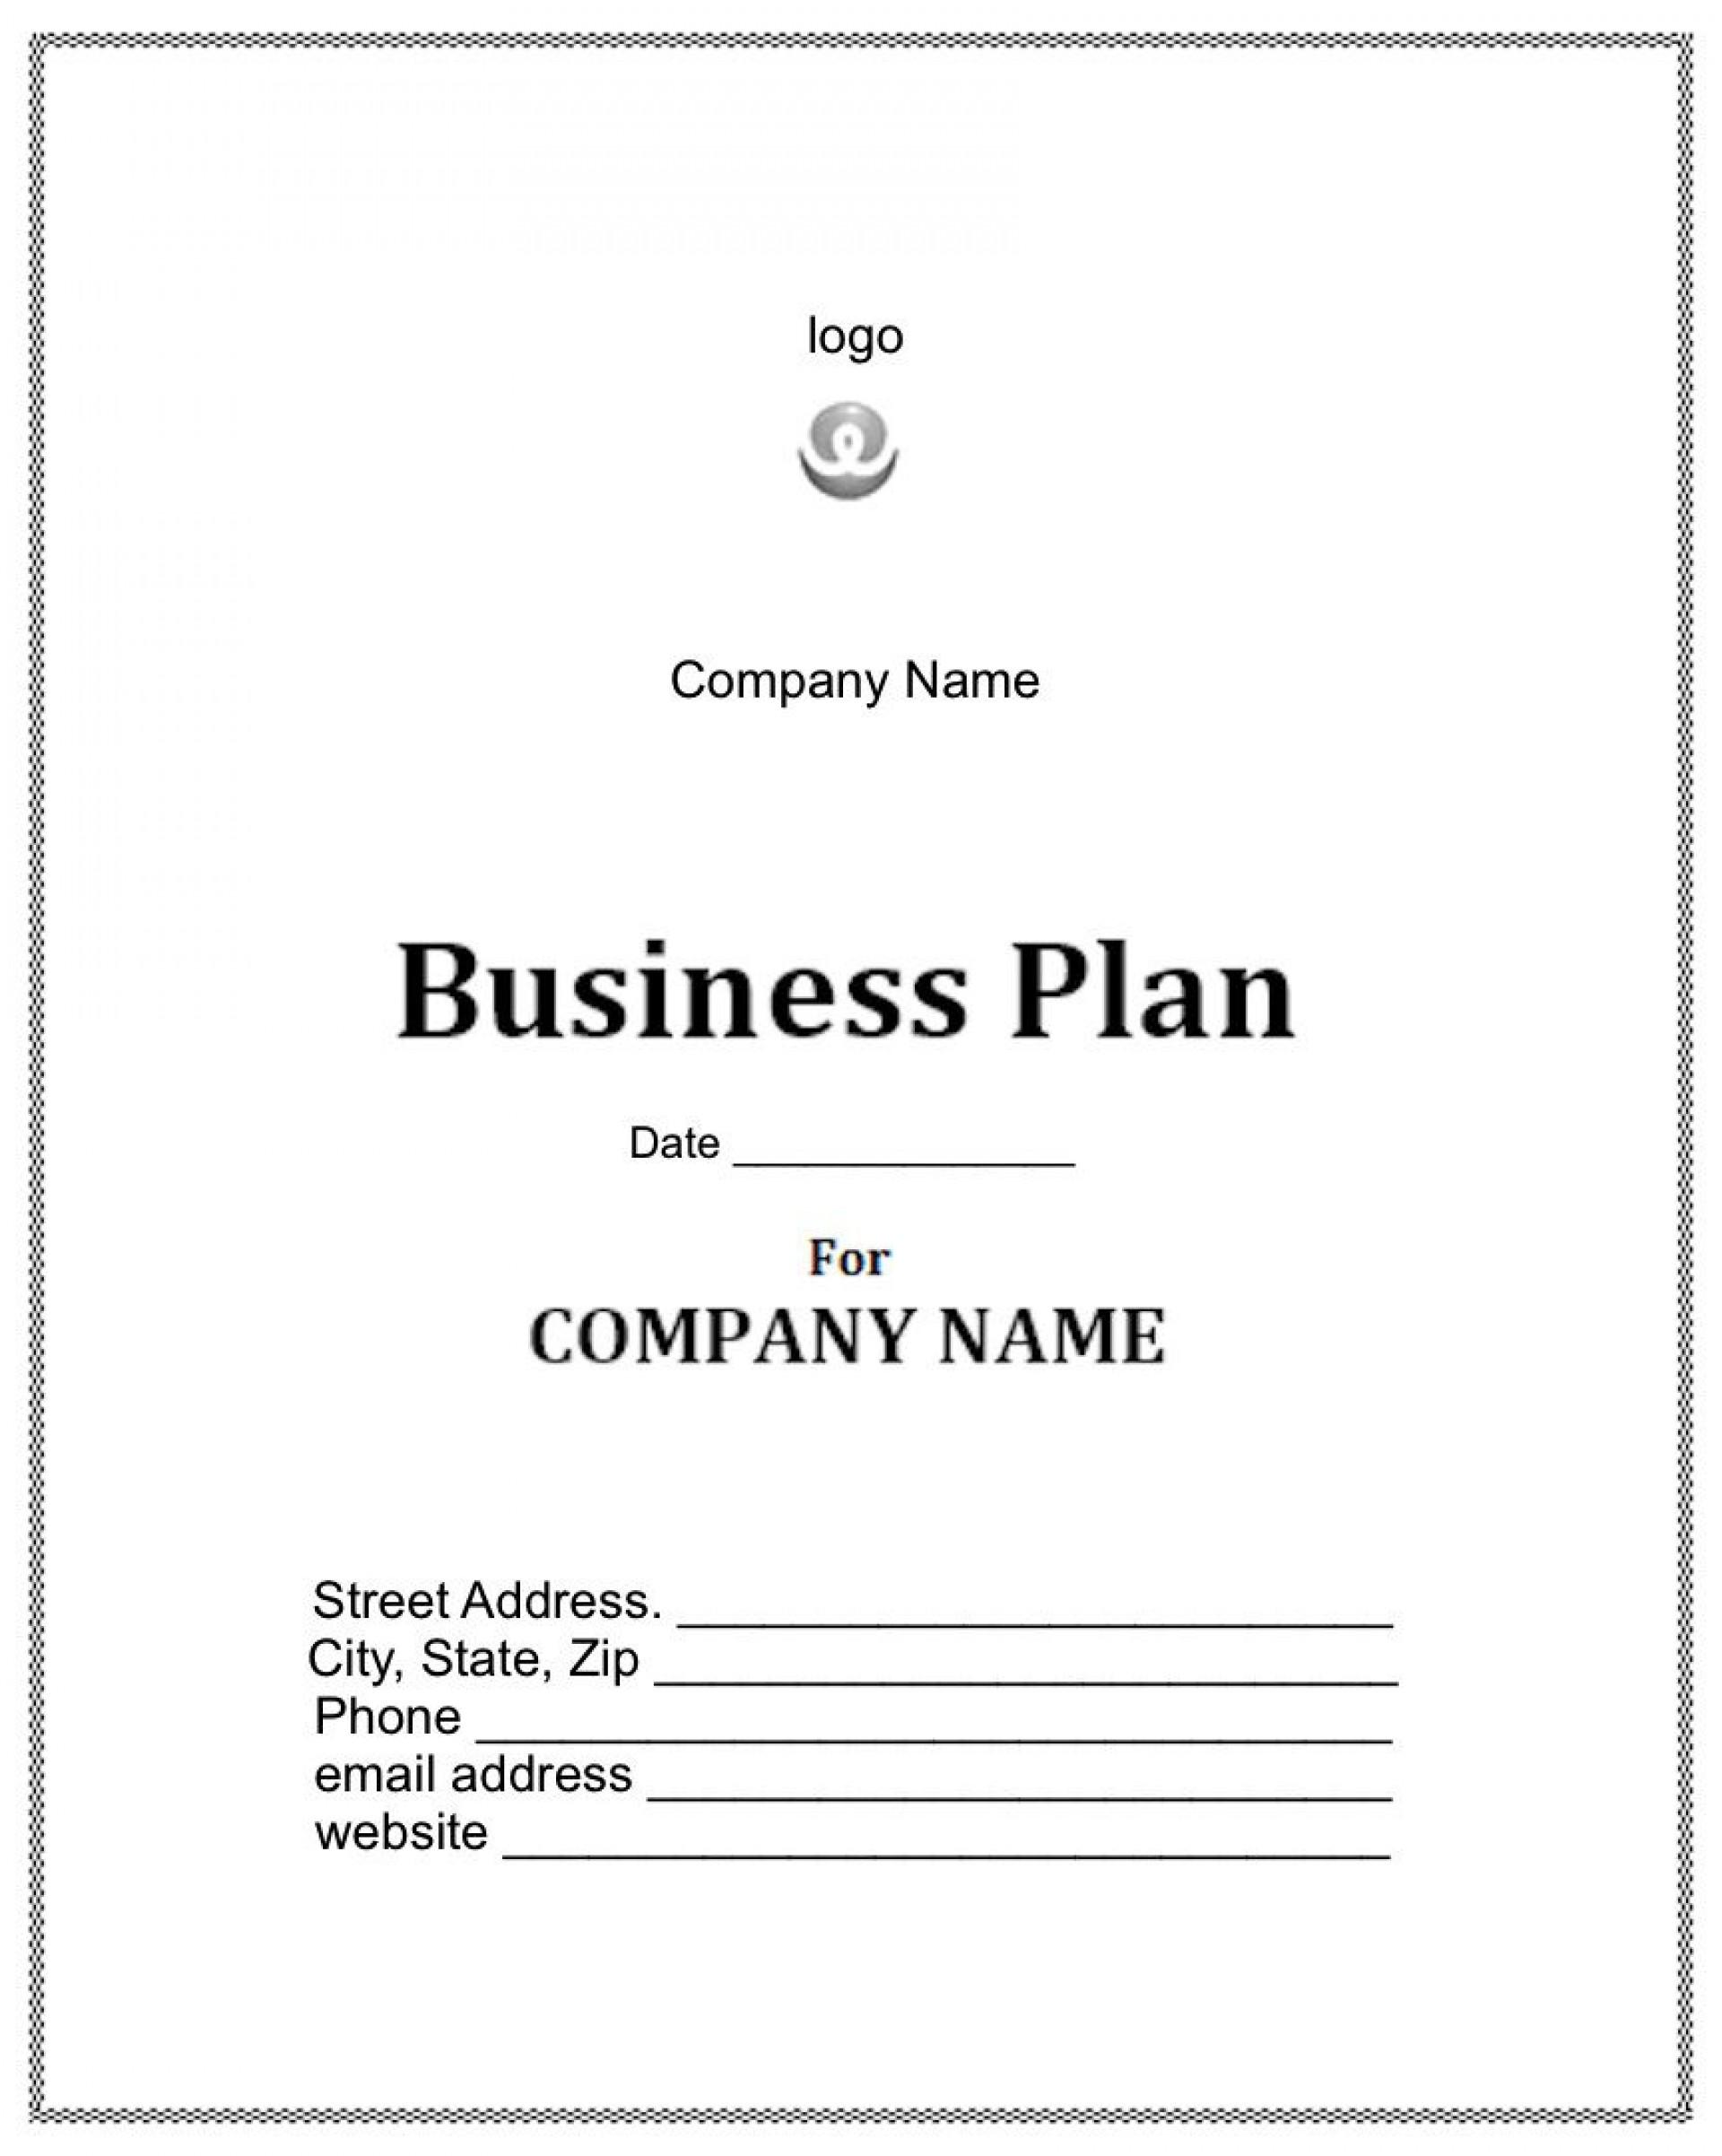 006 Impressive Startup Busines Plan Template Sample  Free Download Doc1920